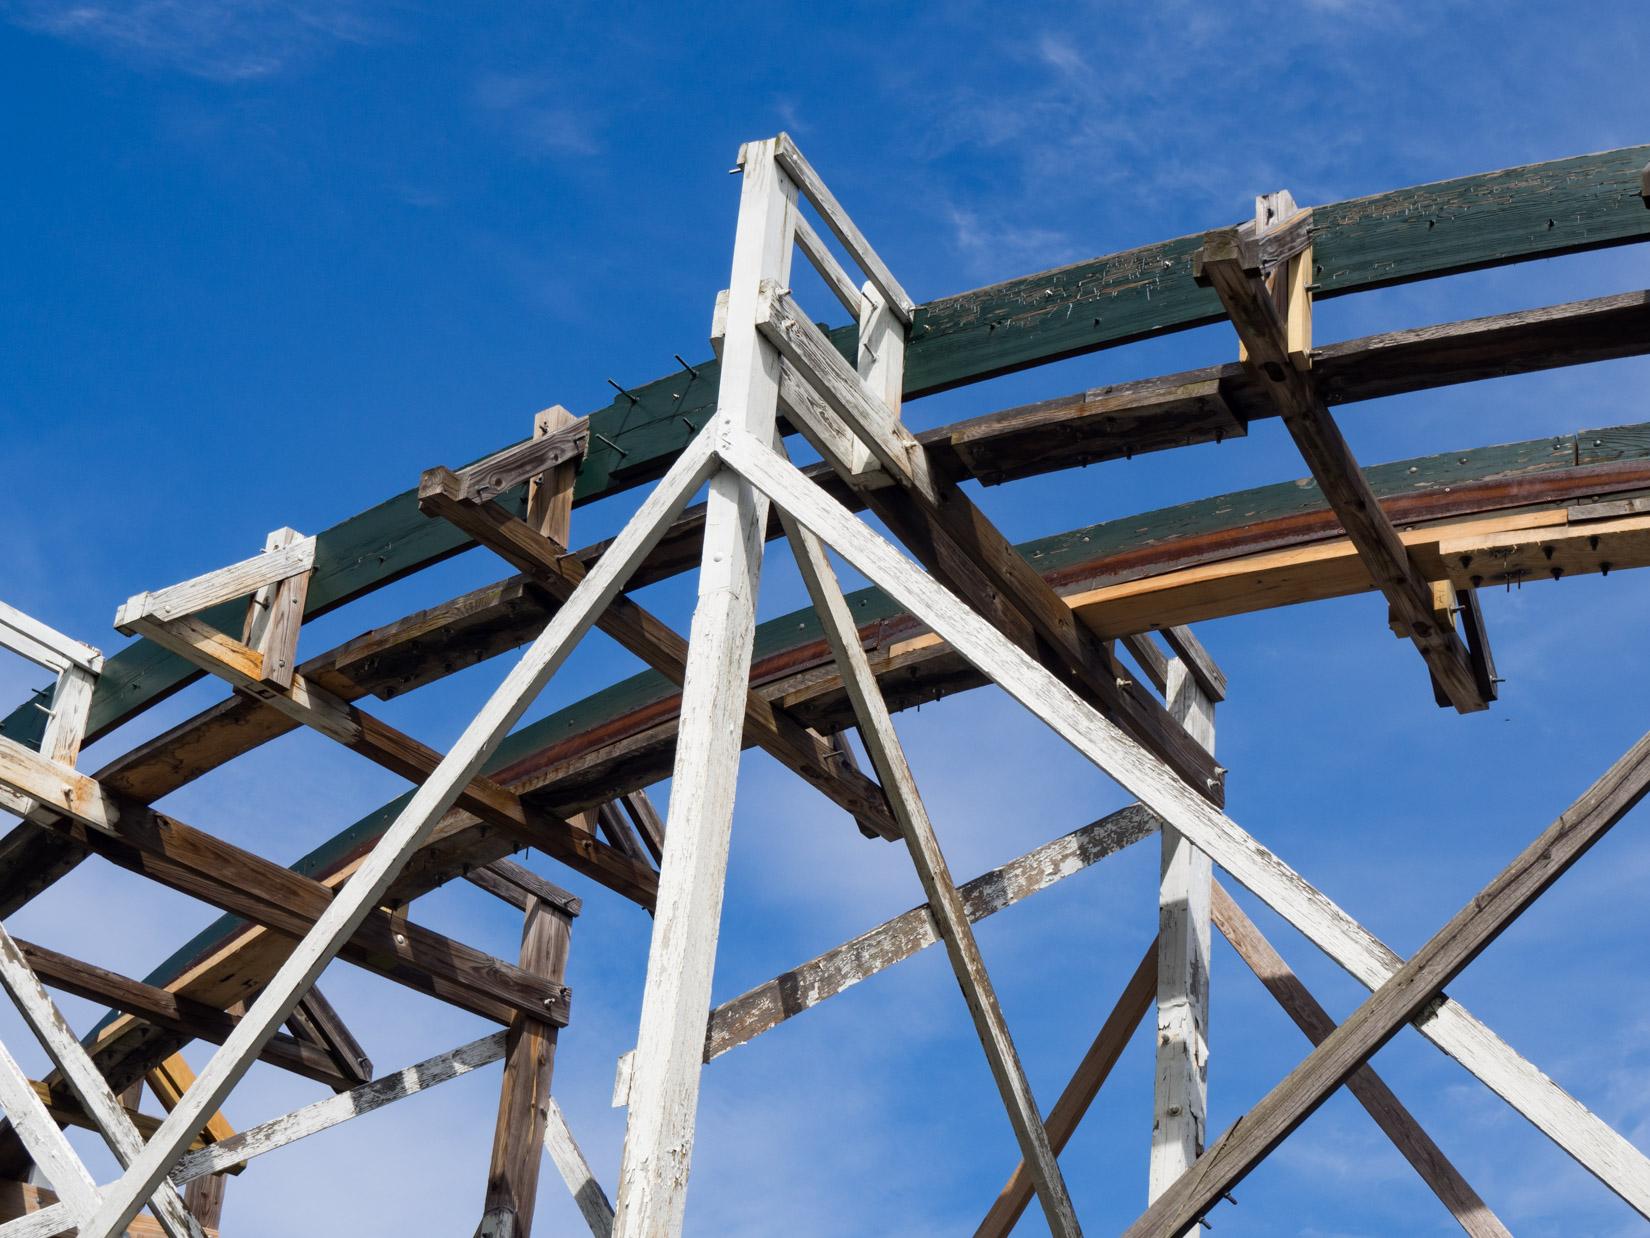 Wooden Rollercoaster Tracks